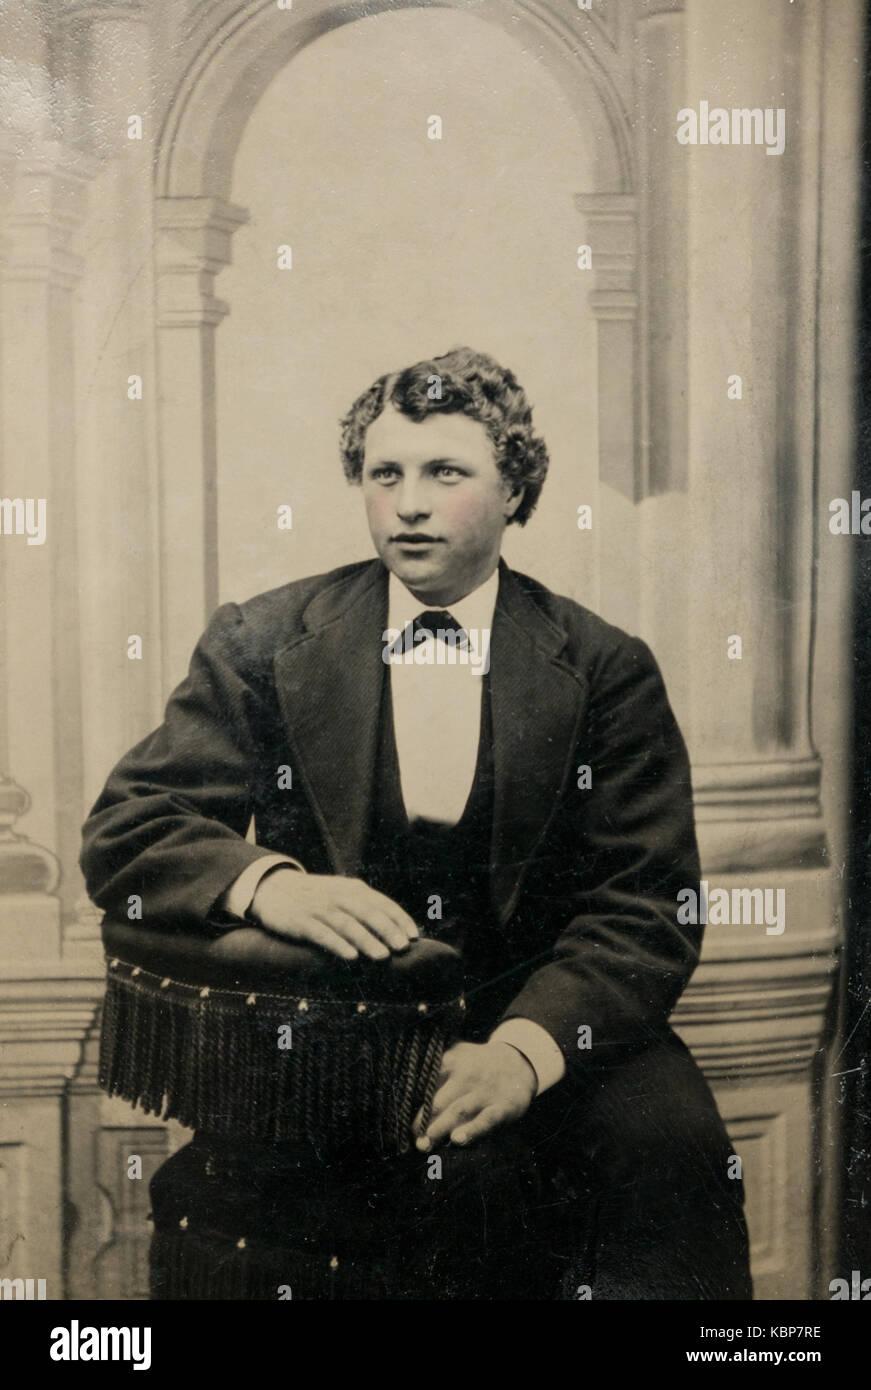 Tintype portrait stock photos tintype portrait stock for Chaise 19eme siecle